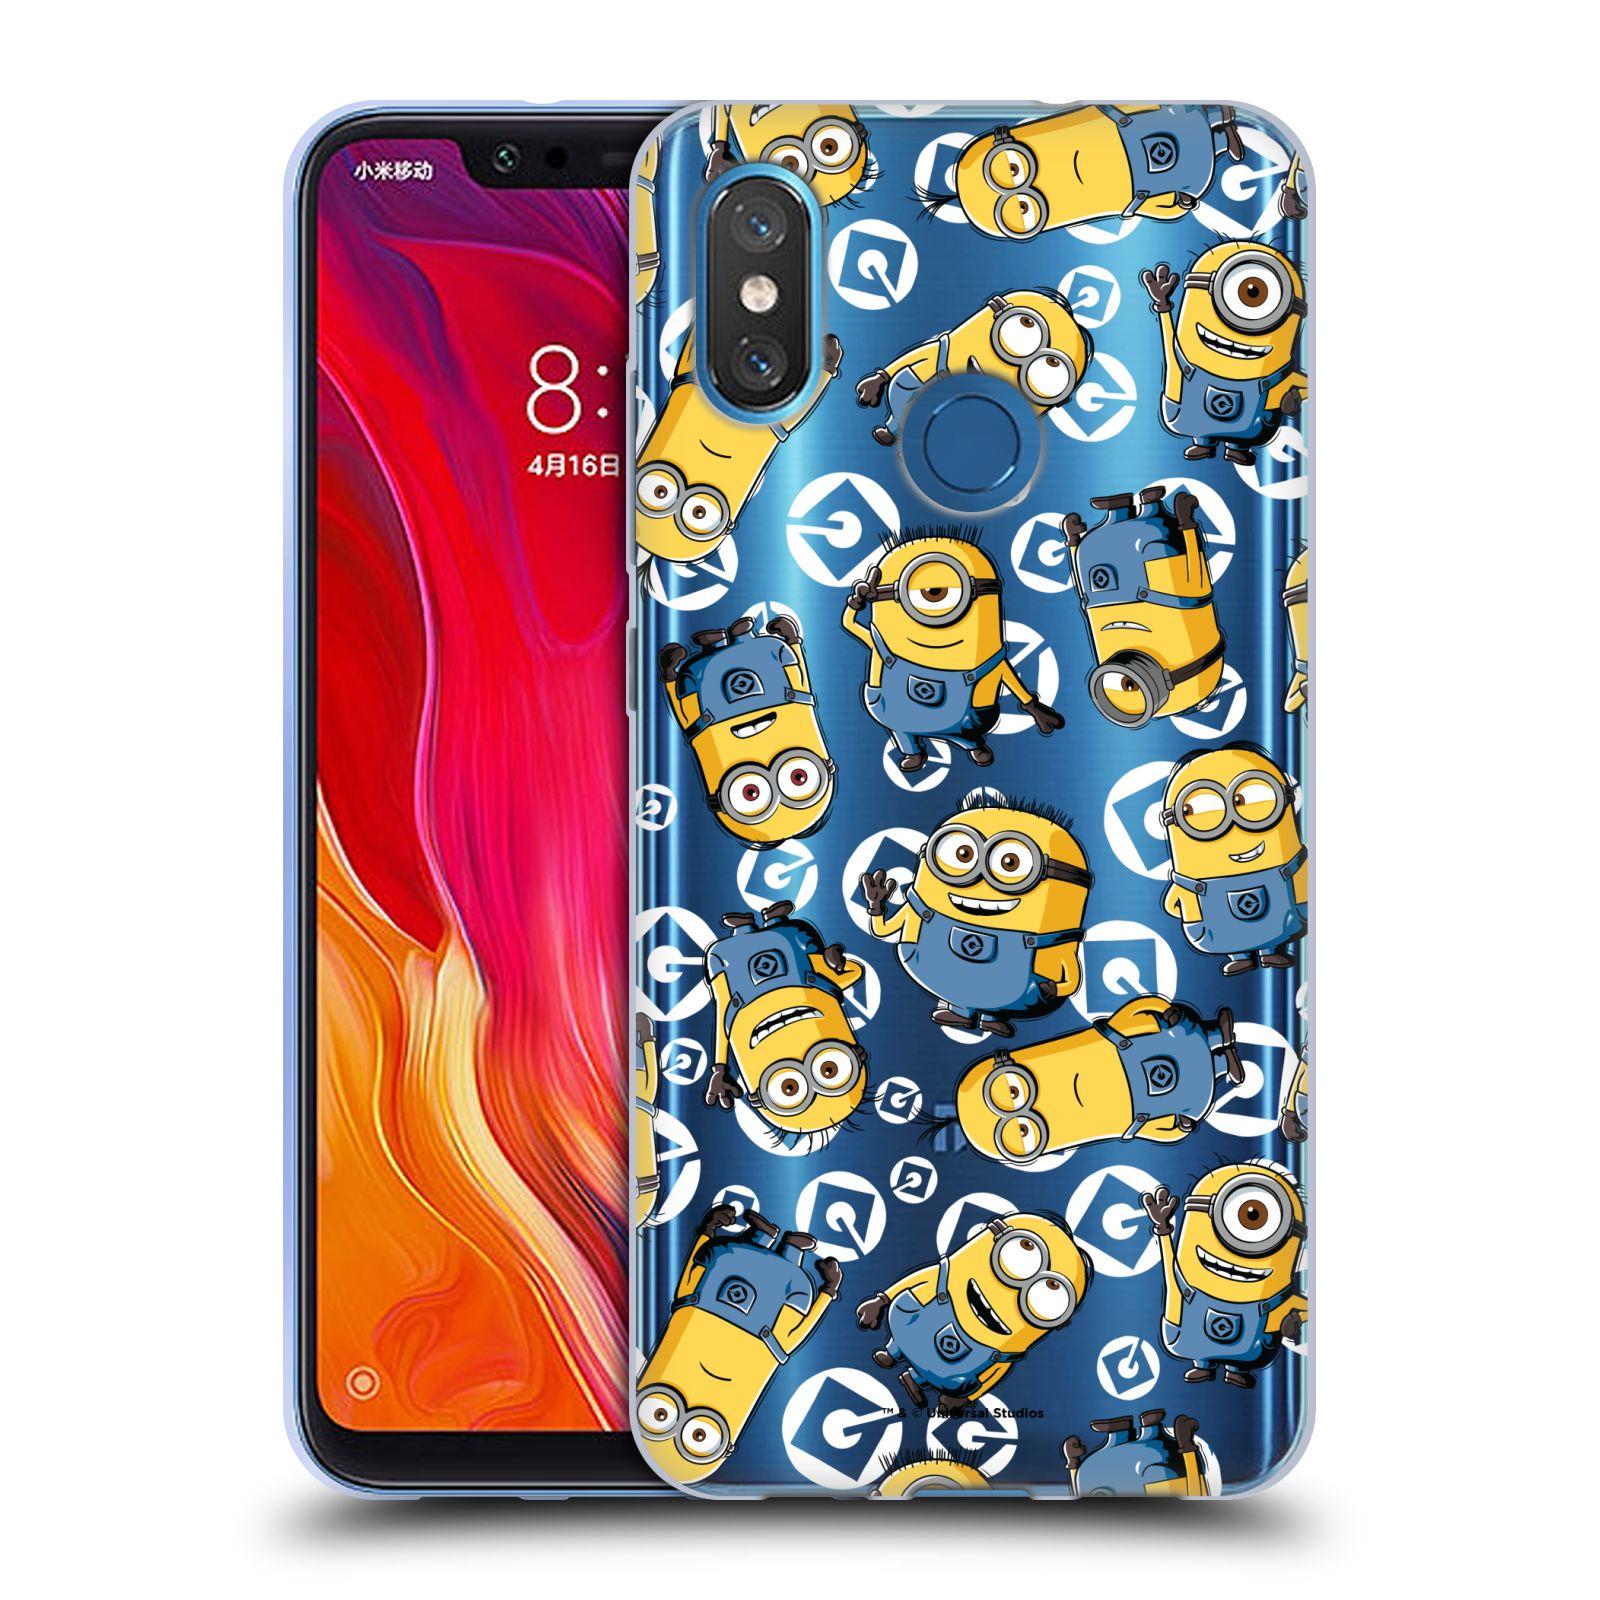 Silikonové pouzdro na mobil Xiaomi Mi8 - Head Case - Minion pattern z filmu Já, padouch - Despicable Me